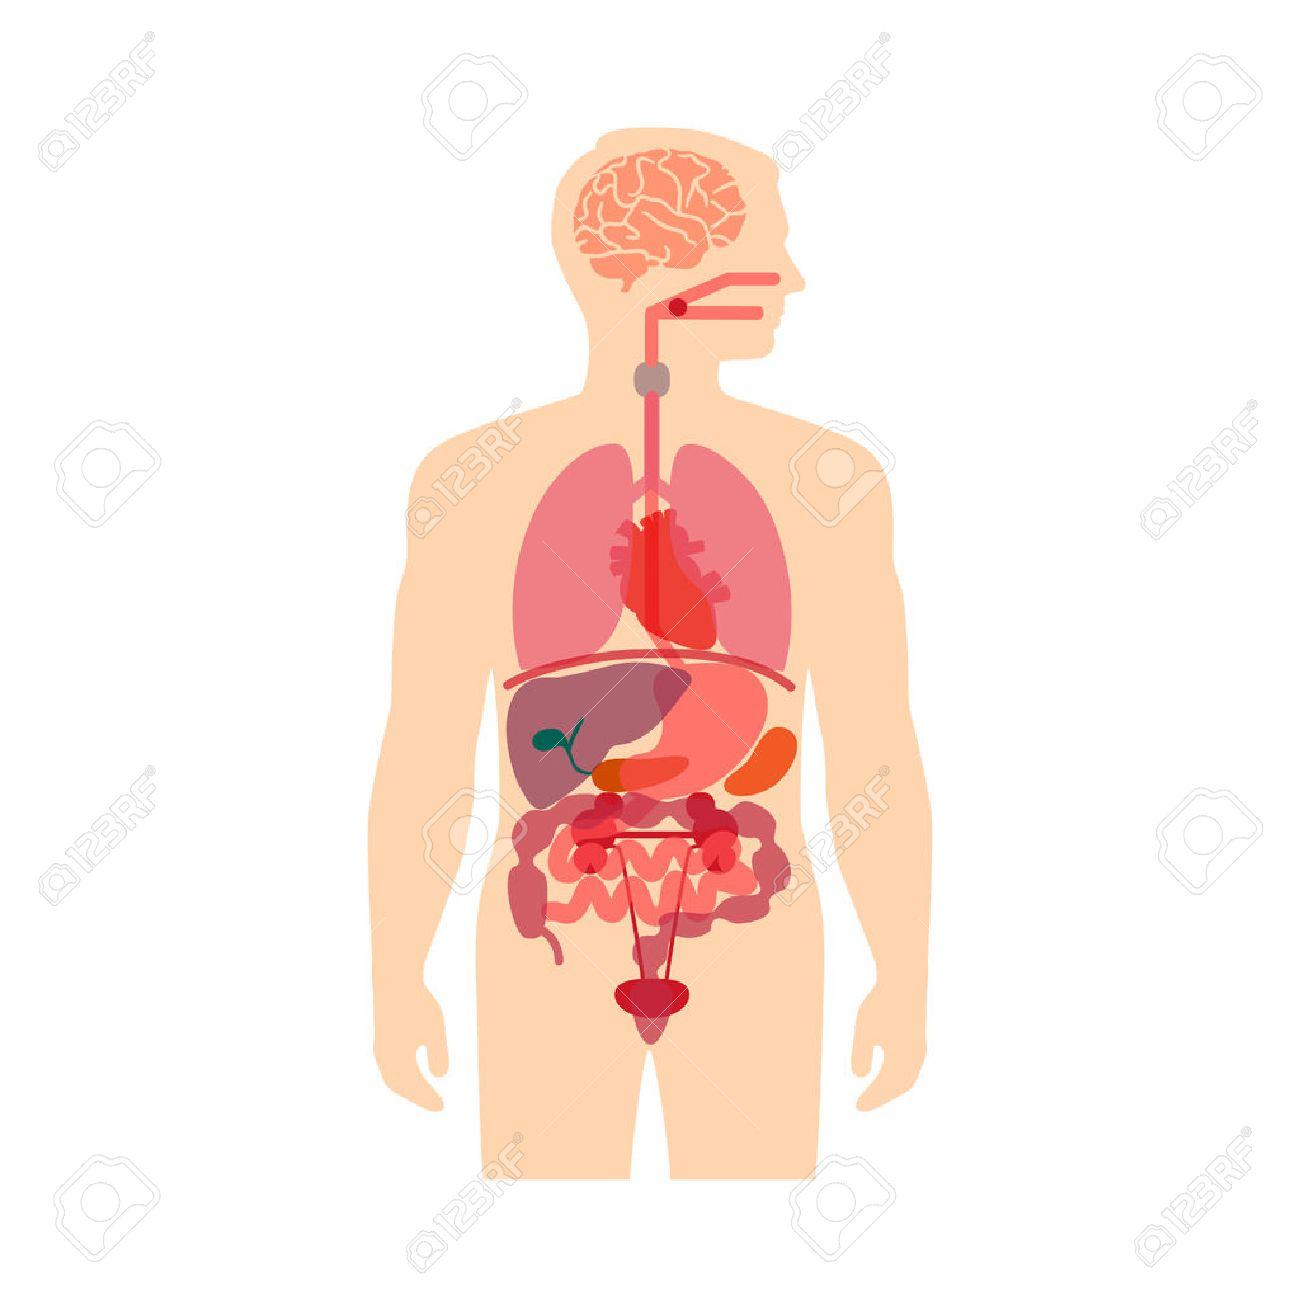 Körper Anatomie, Medizin Organe Vektorsystem, Lizenzfrei Nutzbare ...